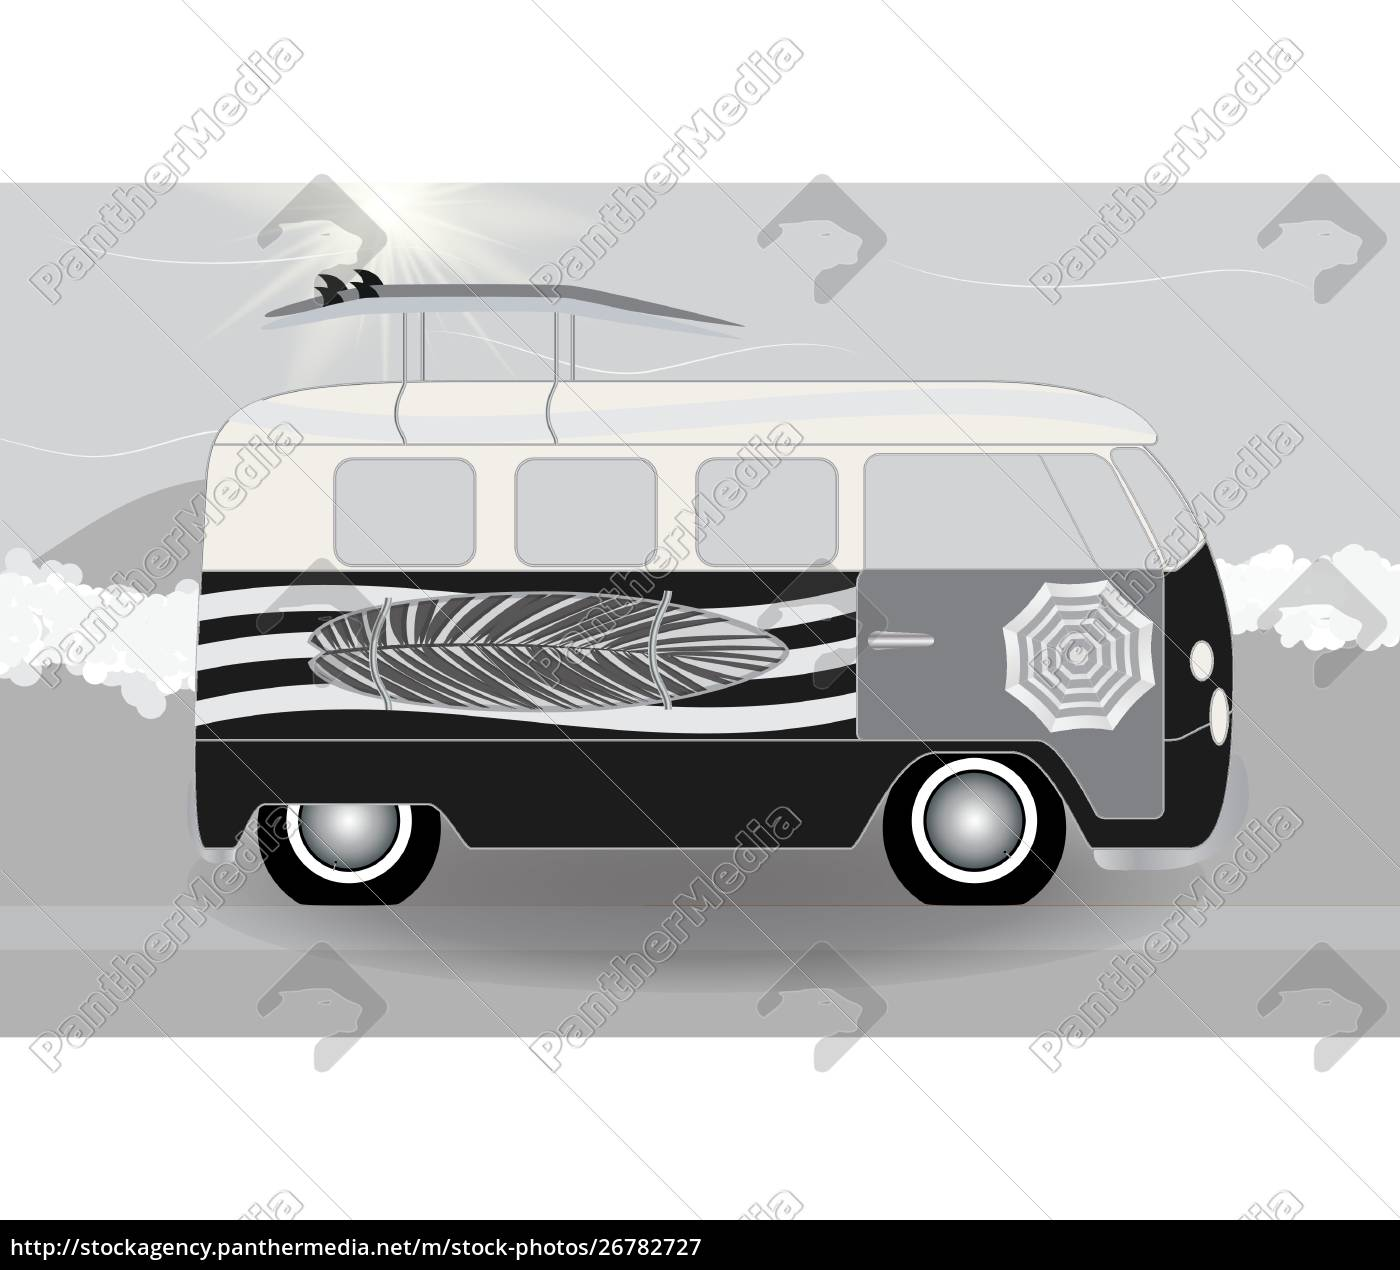 cartoon, van, med, surfbrætter, stående, i - 26782727